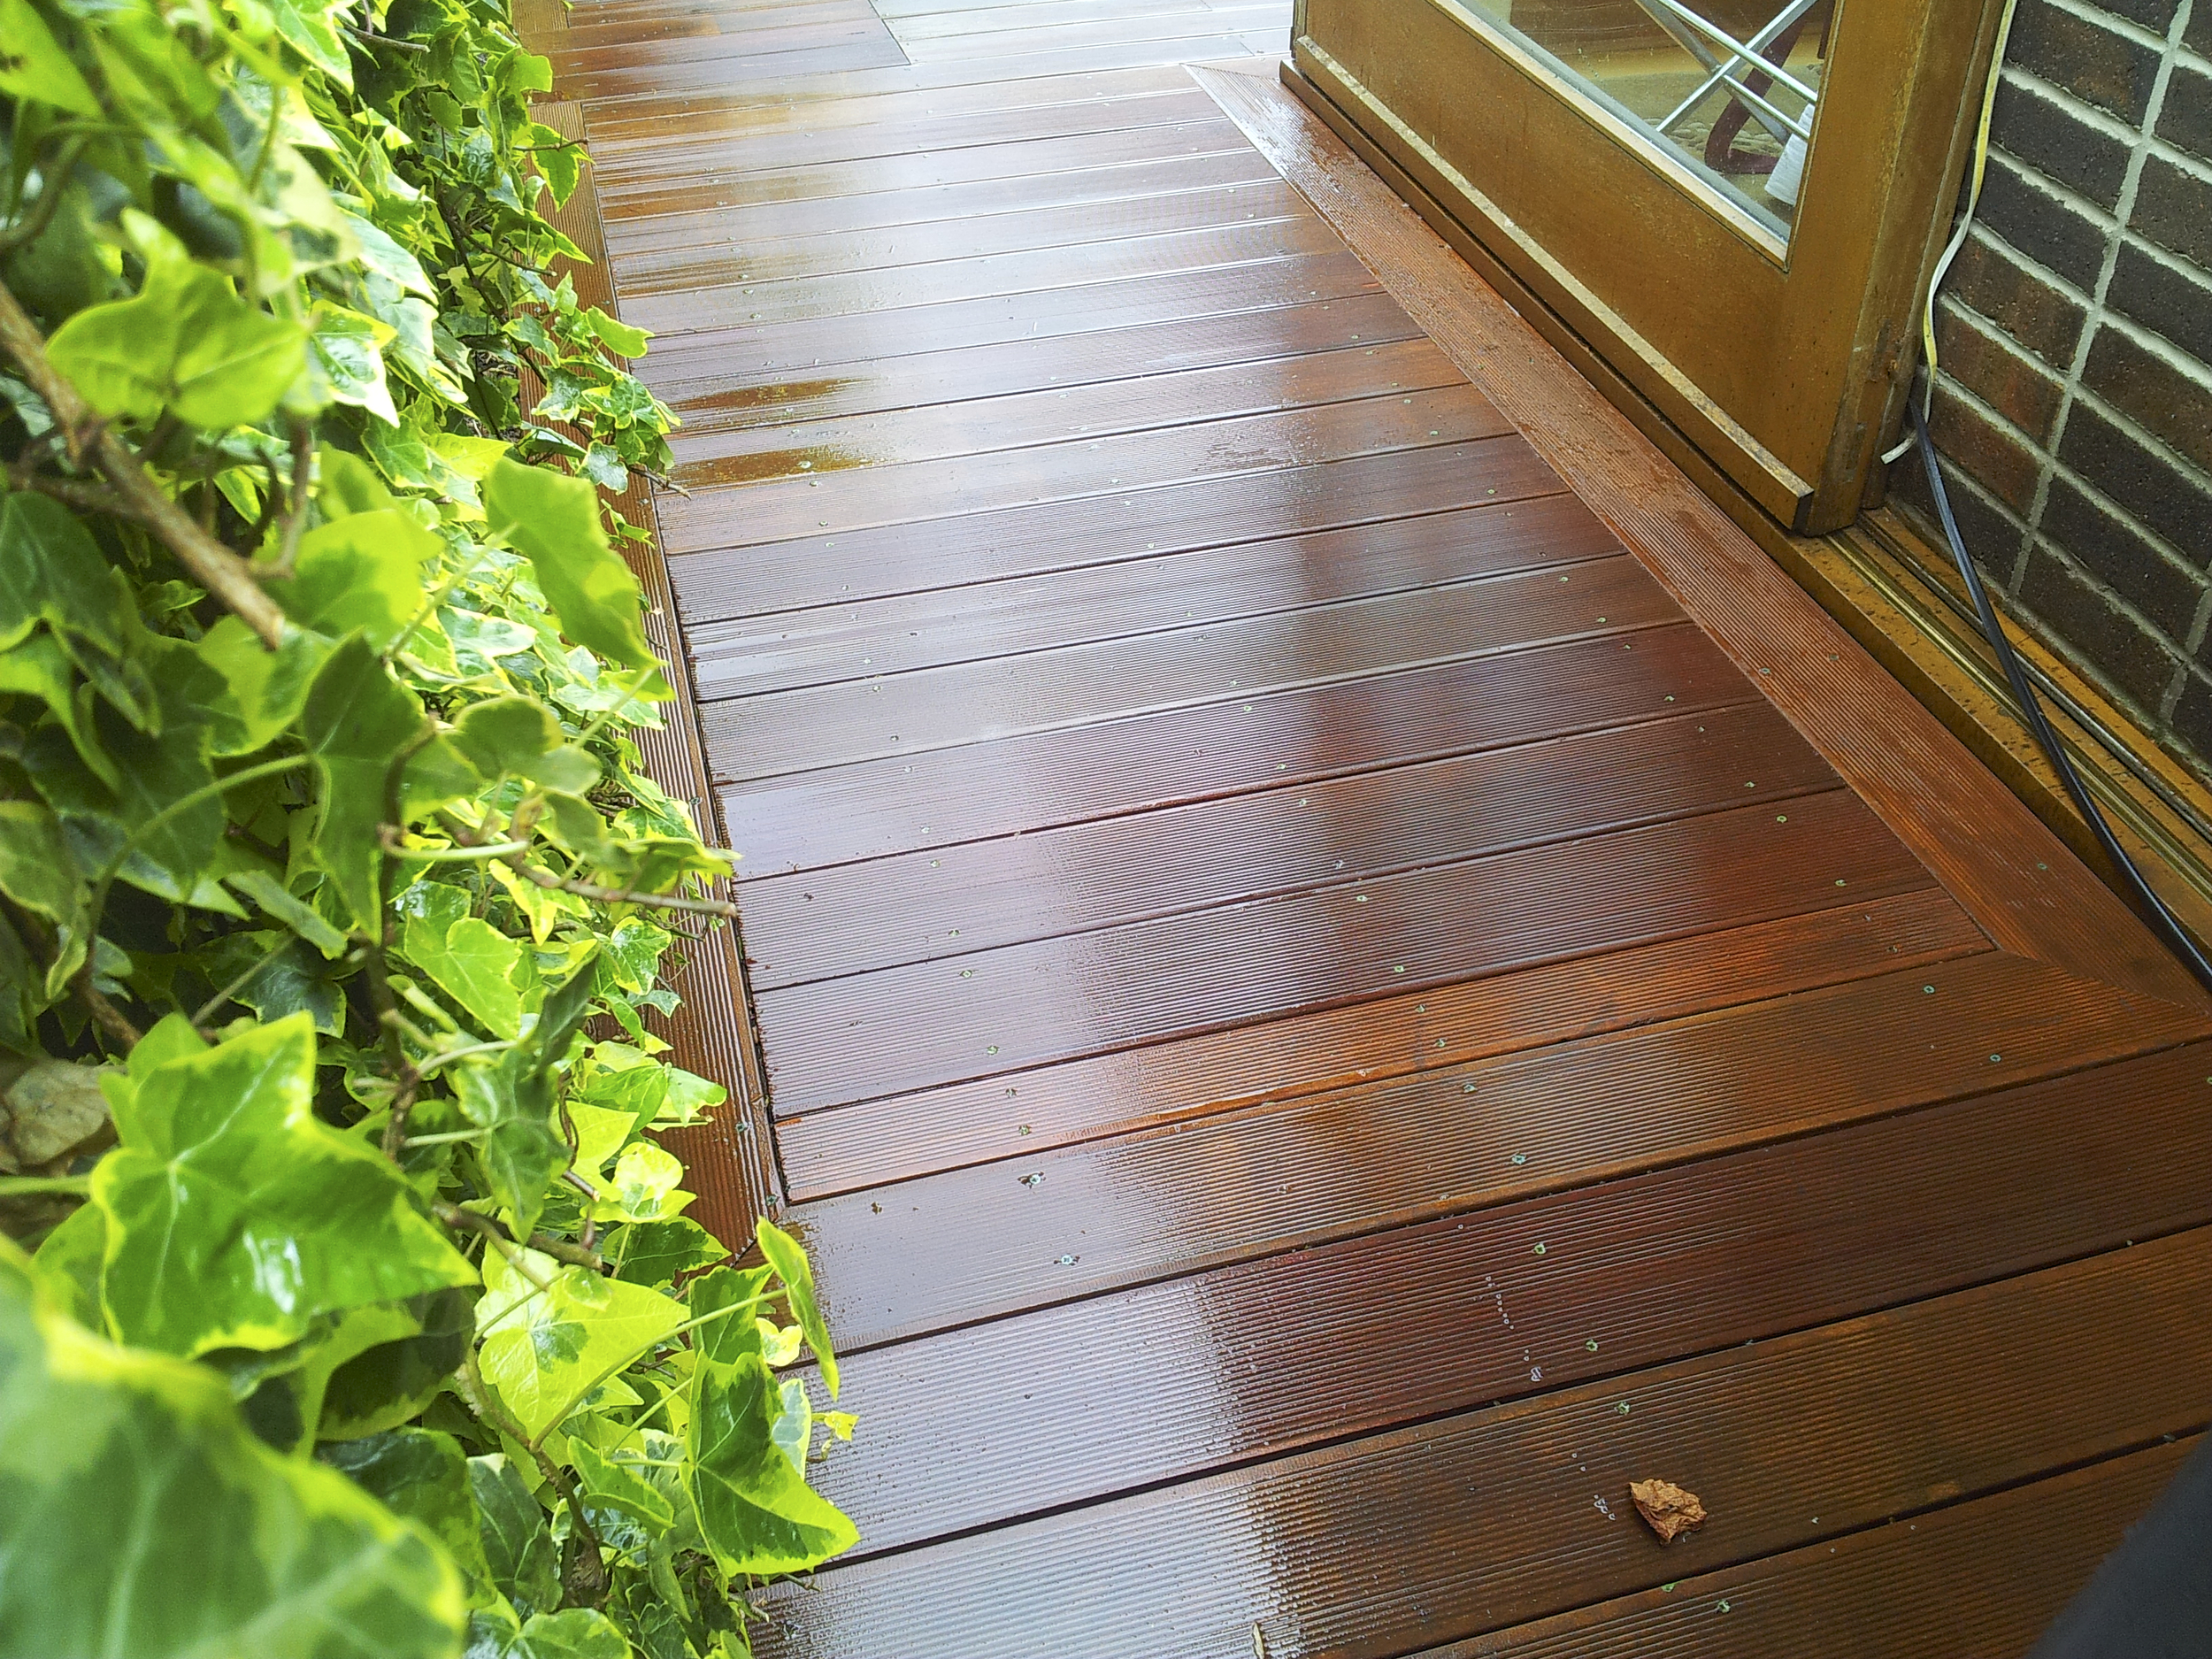 Hardwood deck ramp